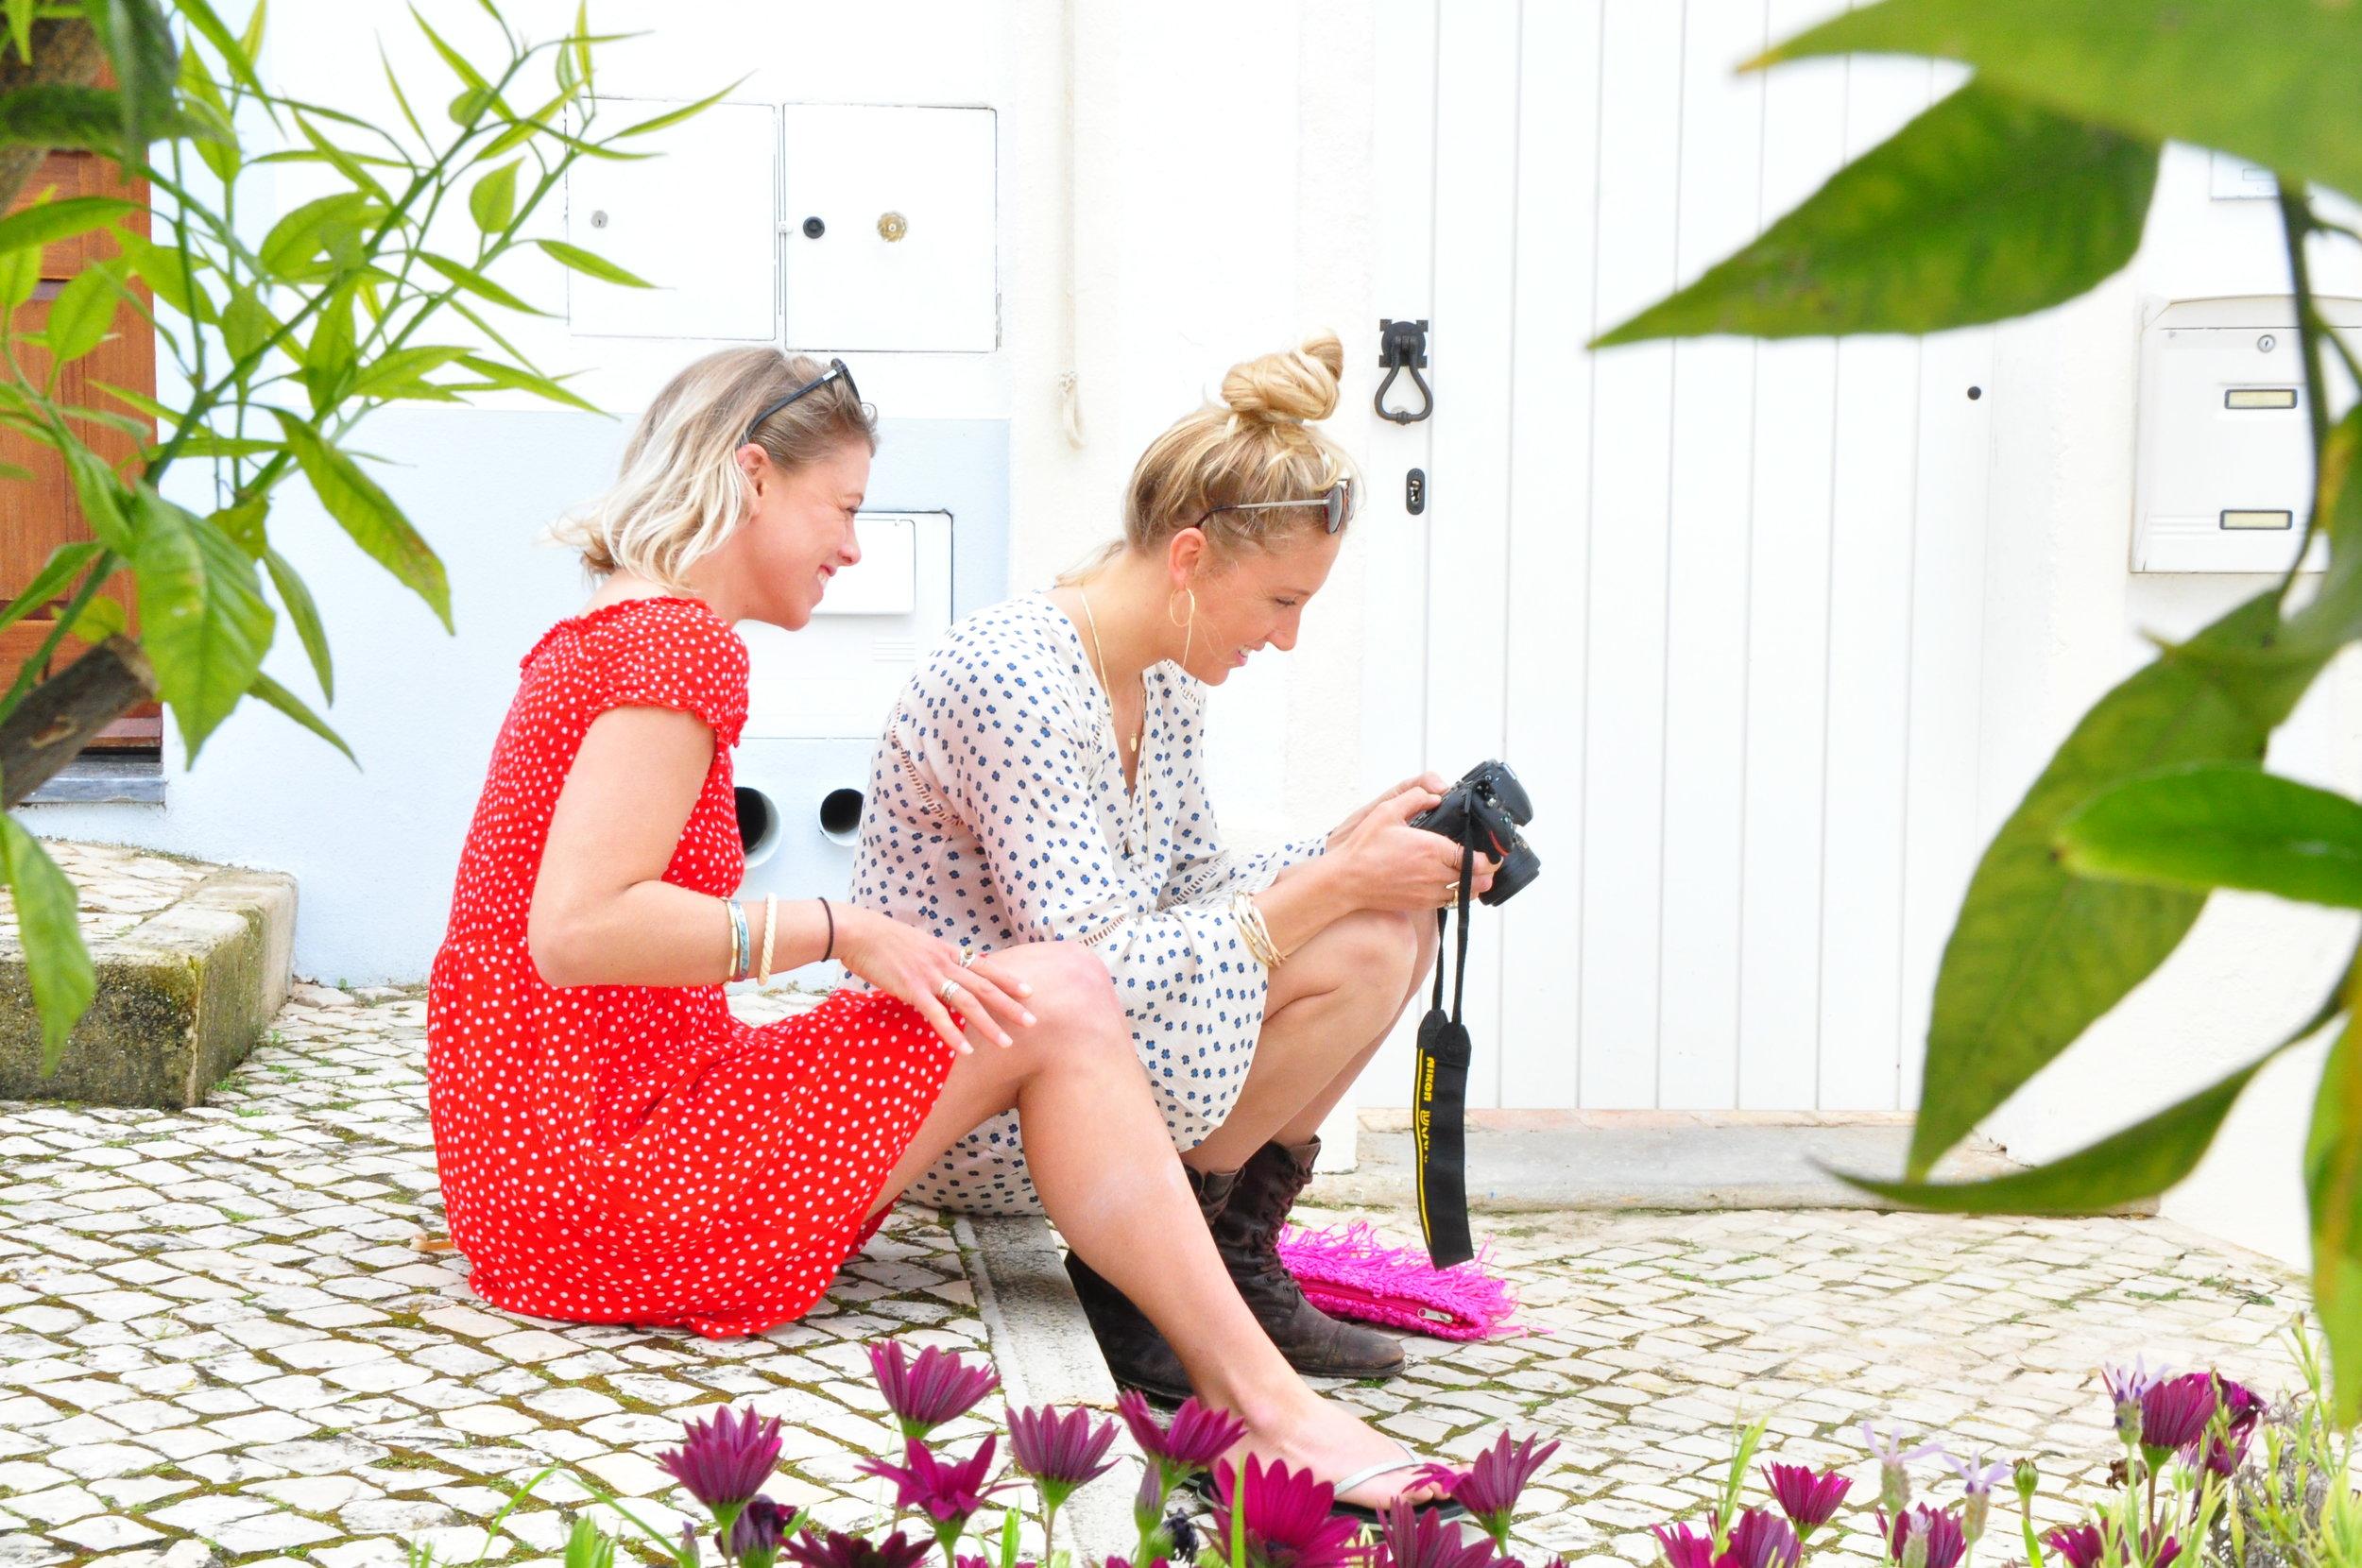 Summer 2018 shoot | Soi 55 behind the scenes